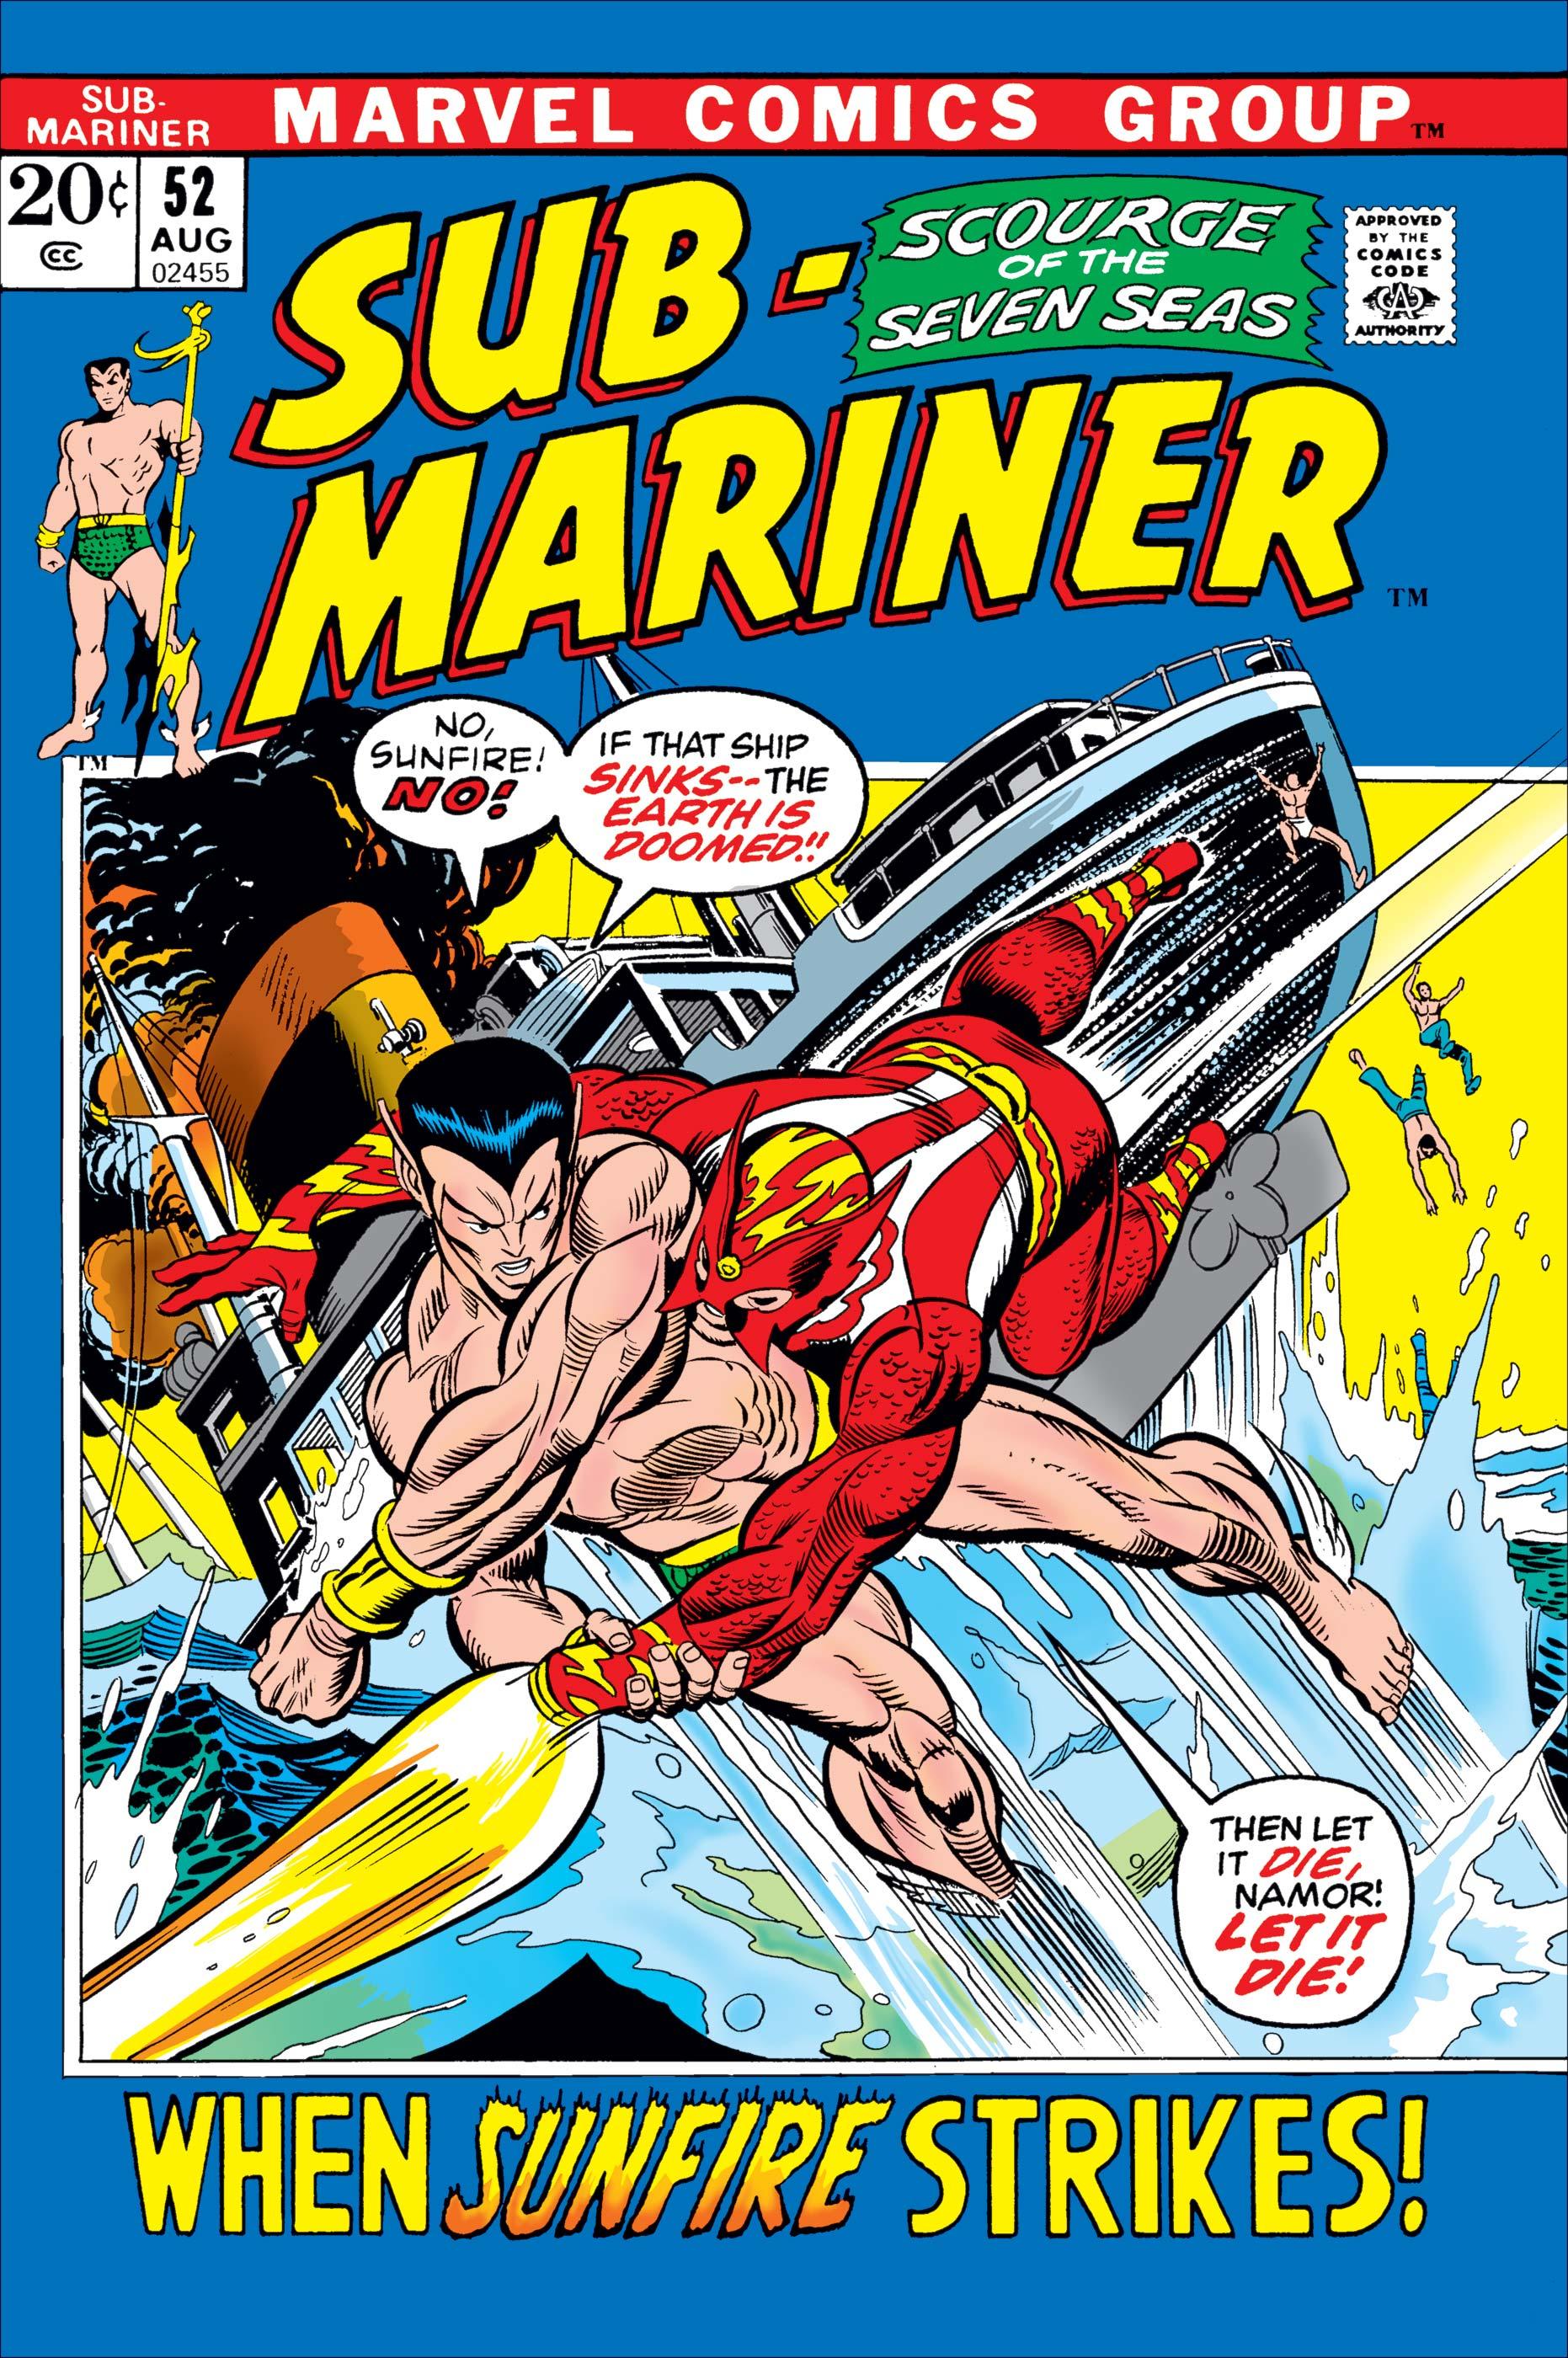 Sub-Mariner (1968) #52